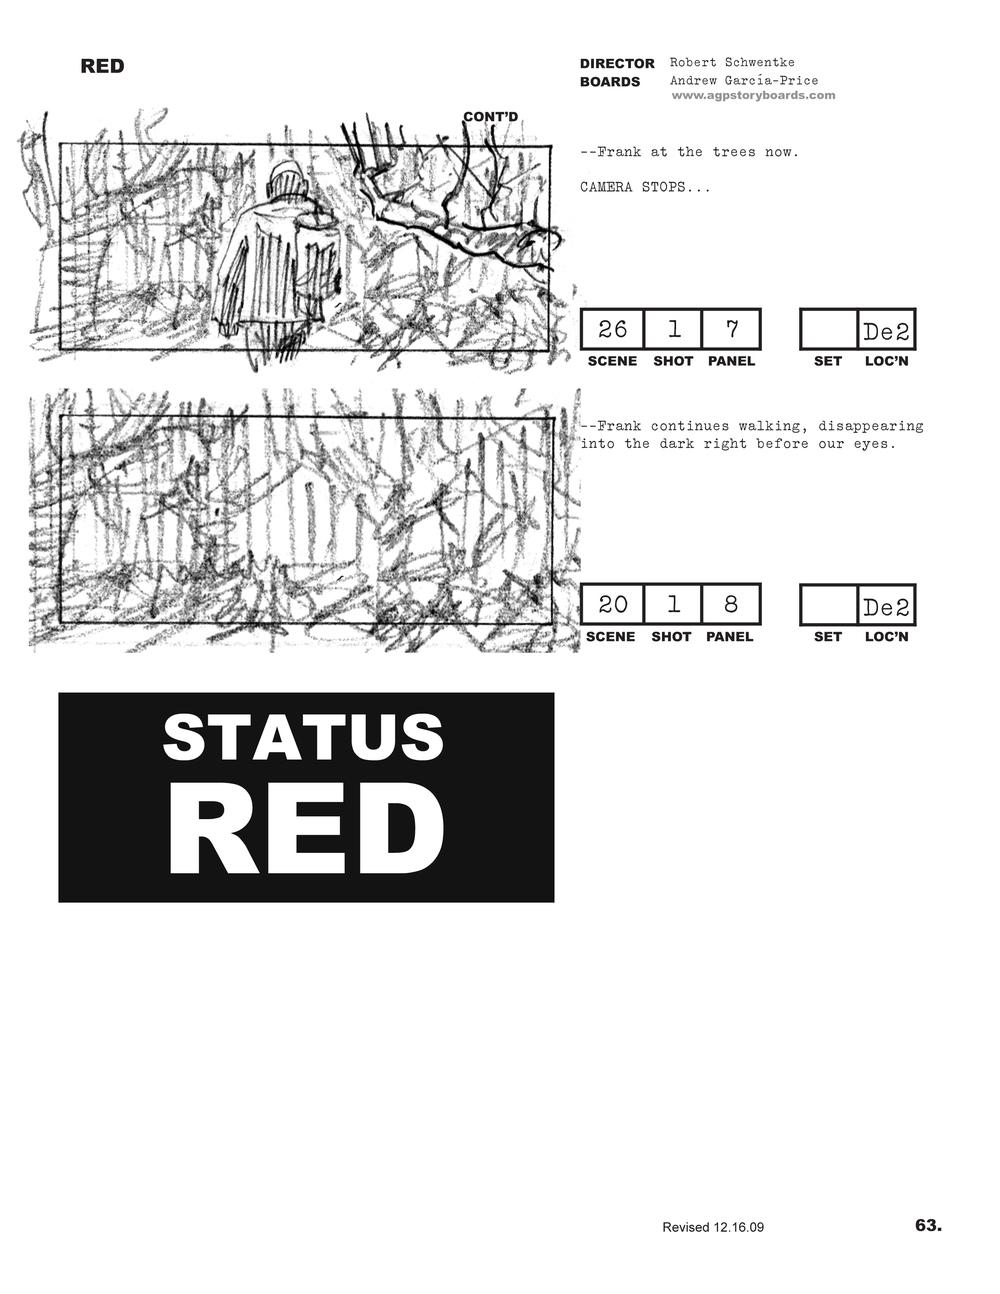 31 RED_sc020-026_p63_091216.jpg